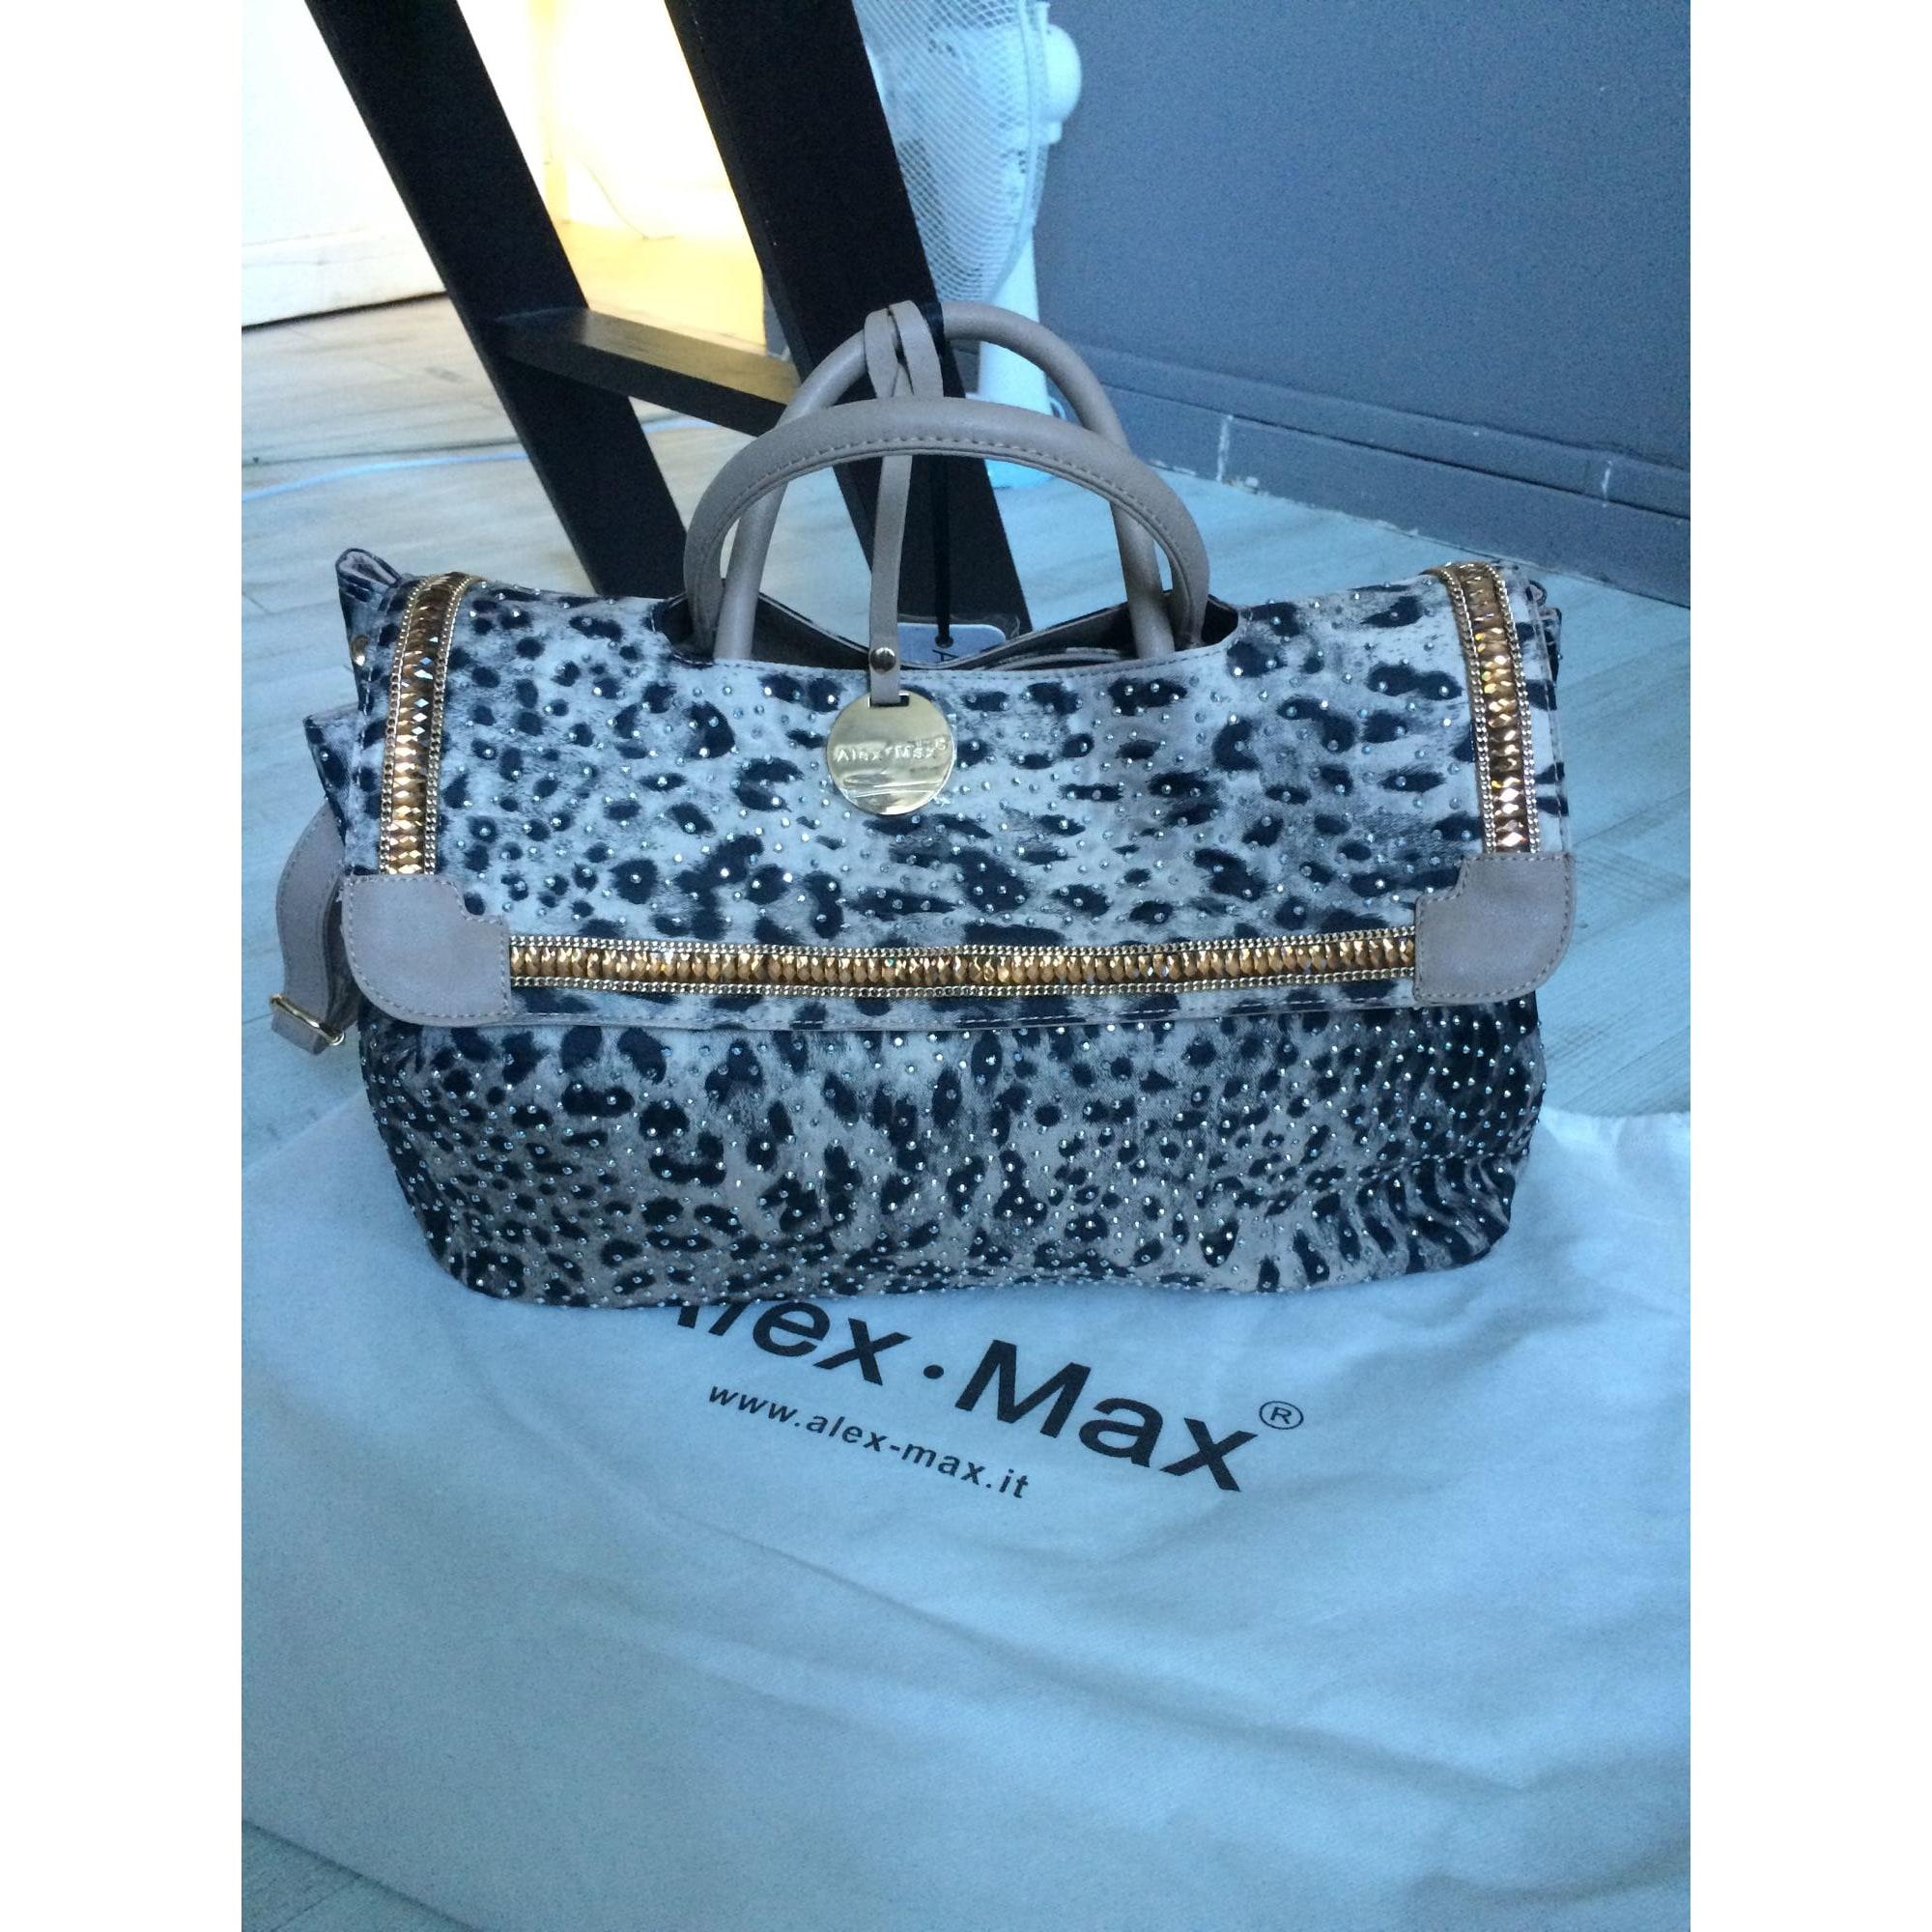 6d1a3f6c6070e Borsa XL in tessuto ALEX MAX beige coffe black - 3826626